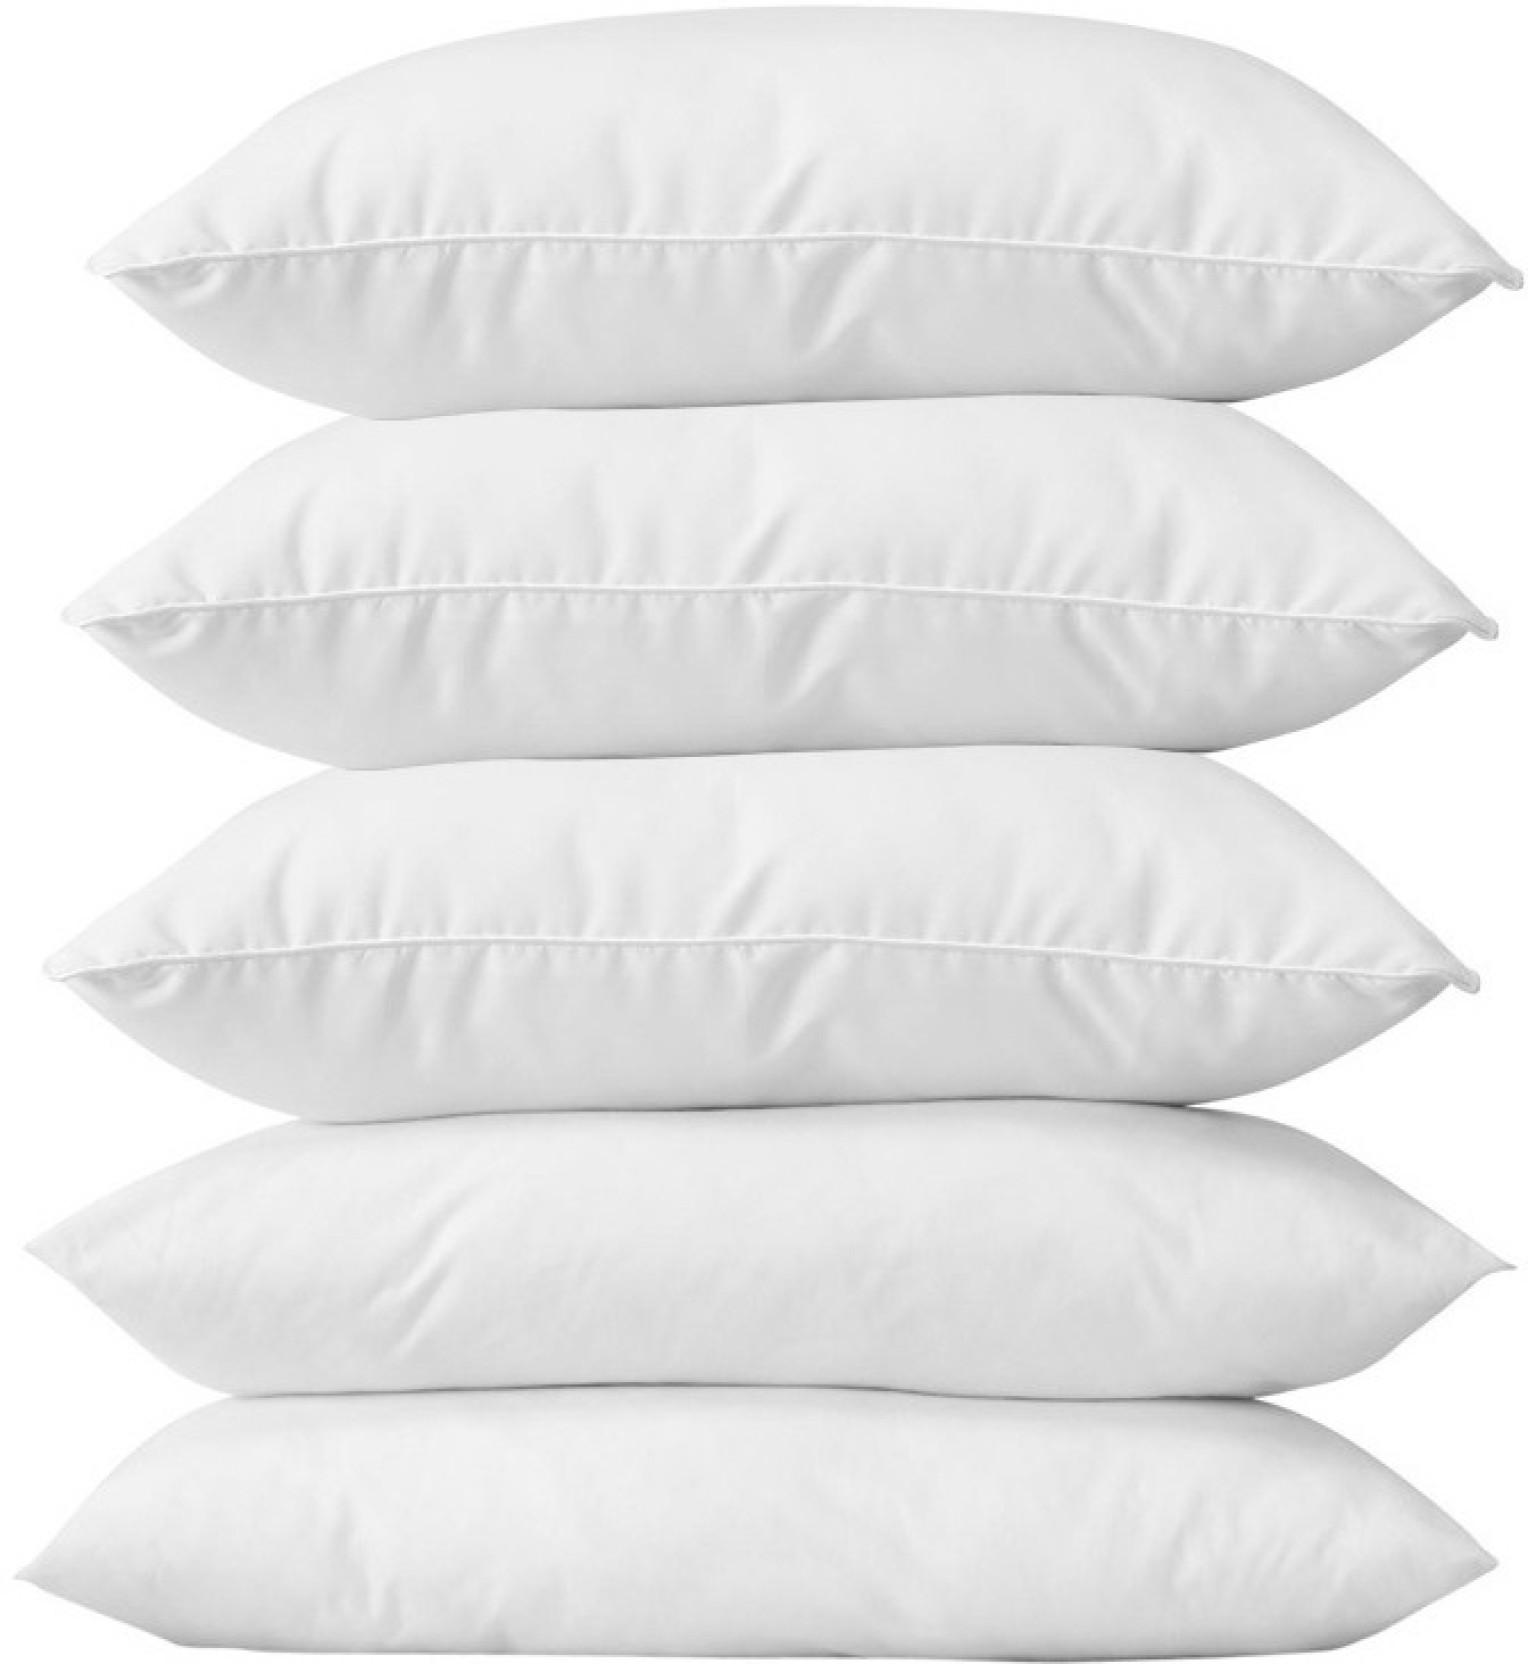 Panipat Textile Hub Plain Bed Sleeping Pillow Buy Panipat